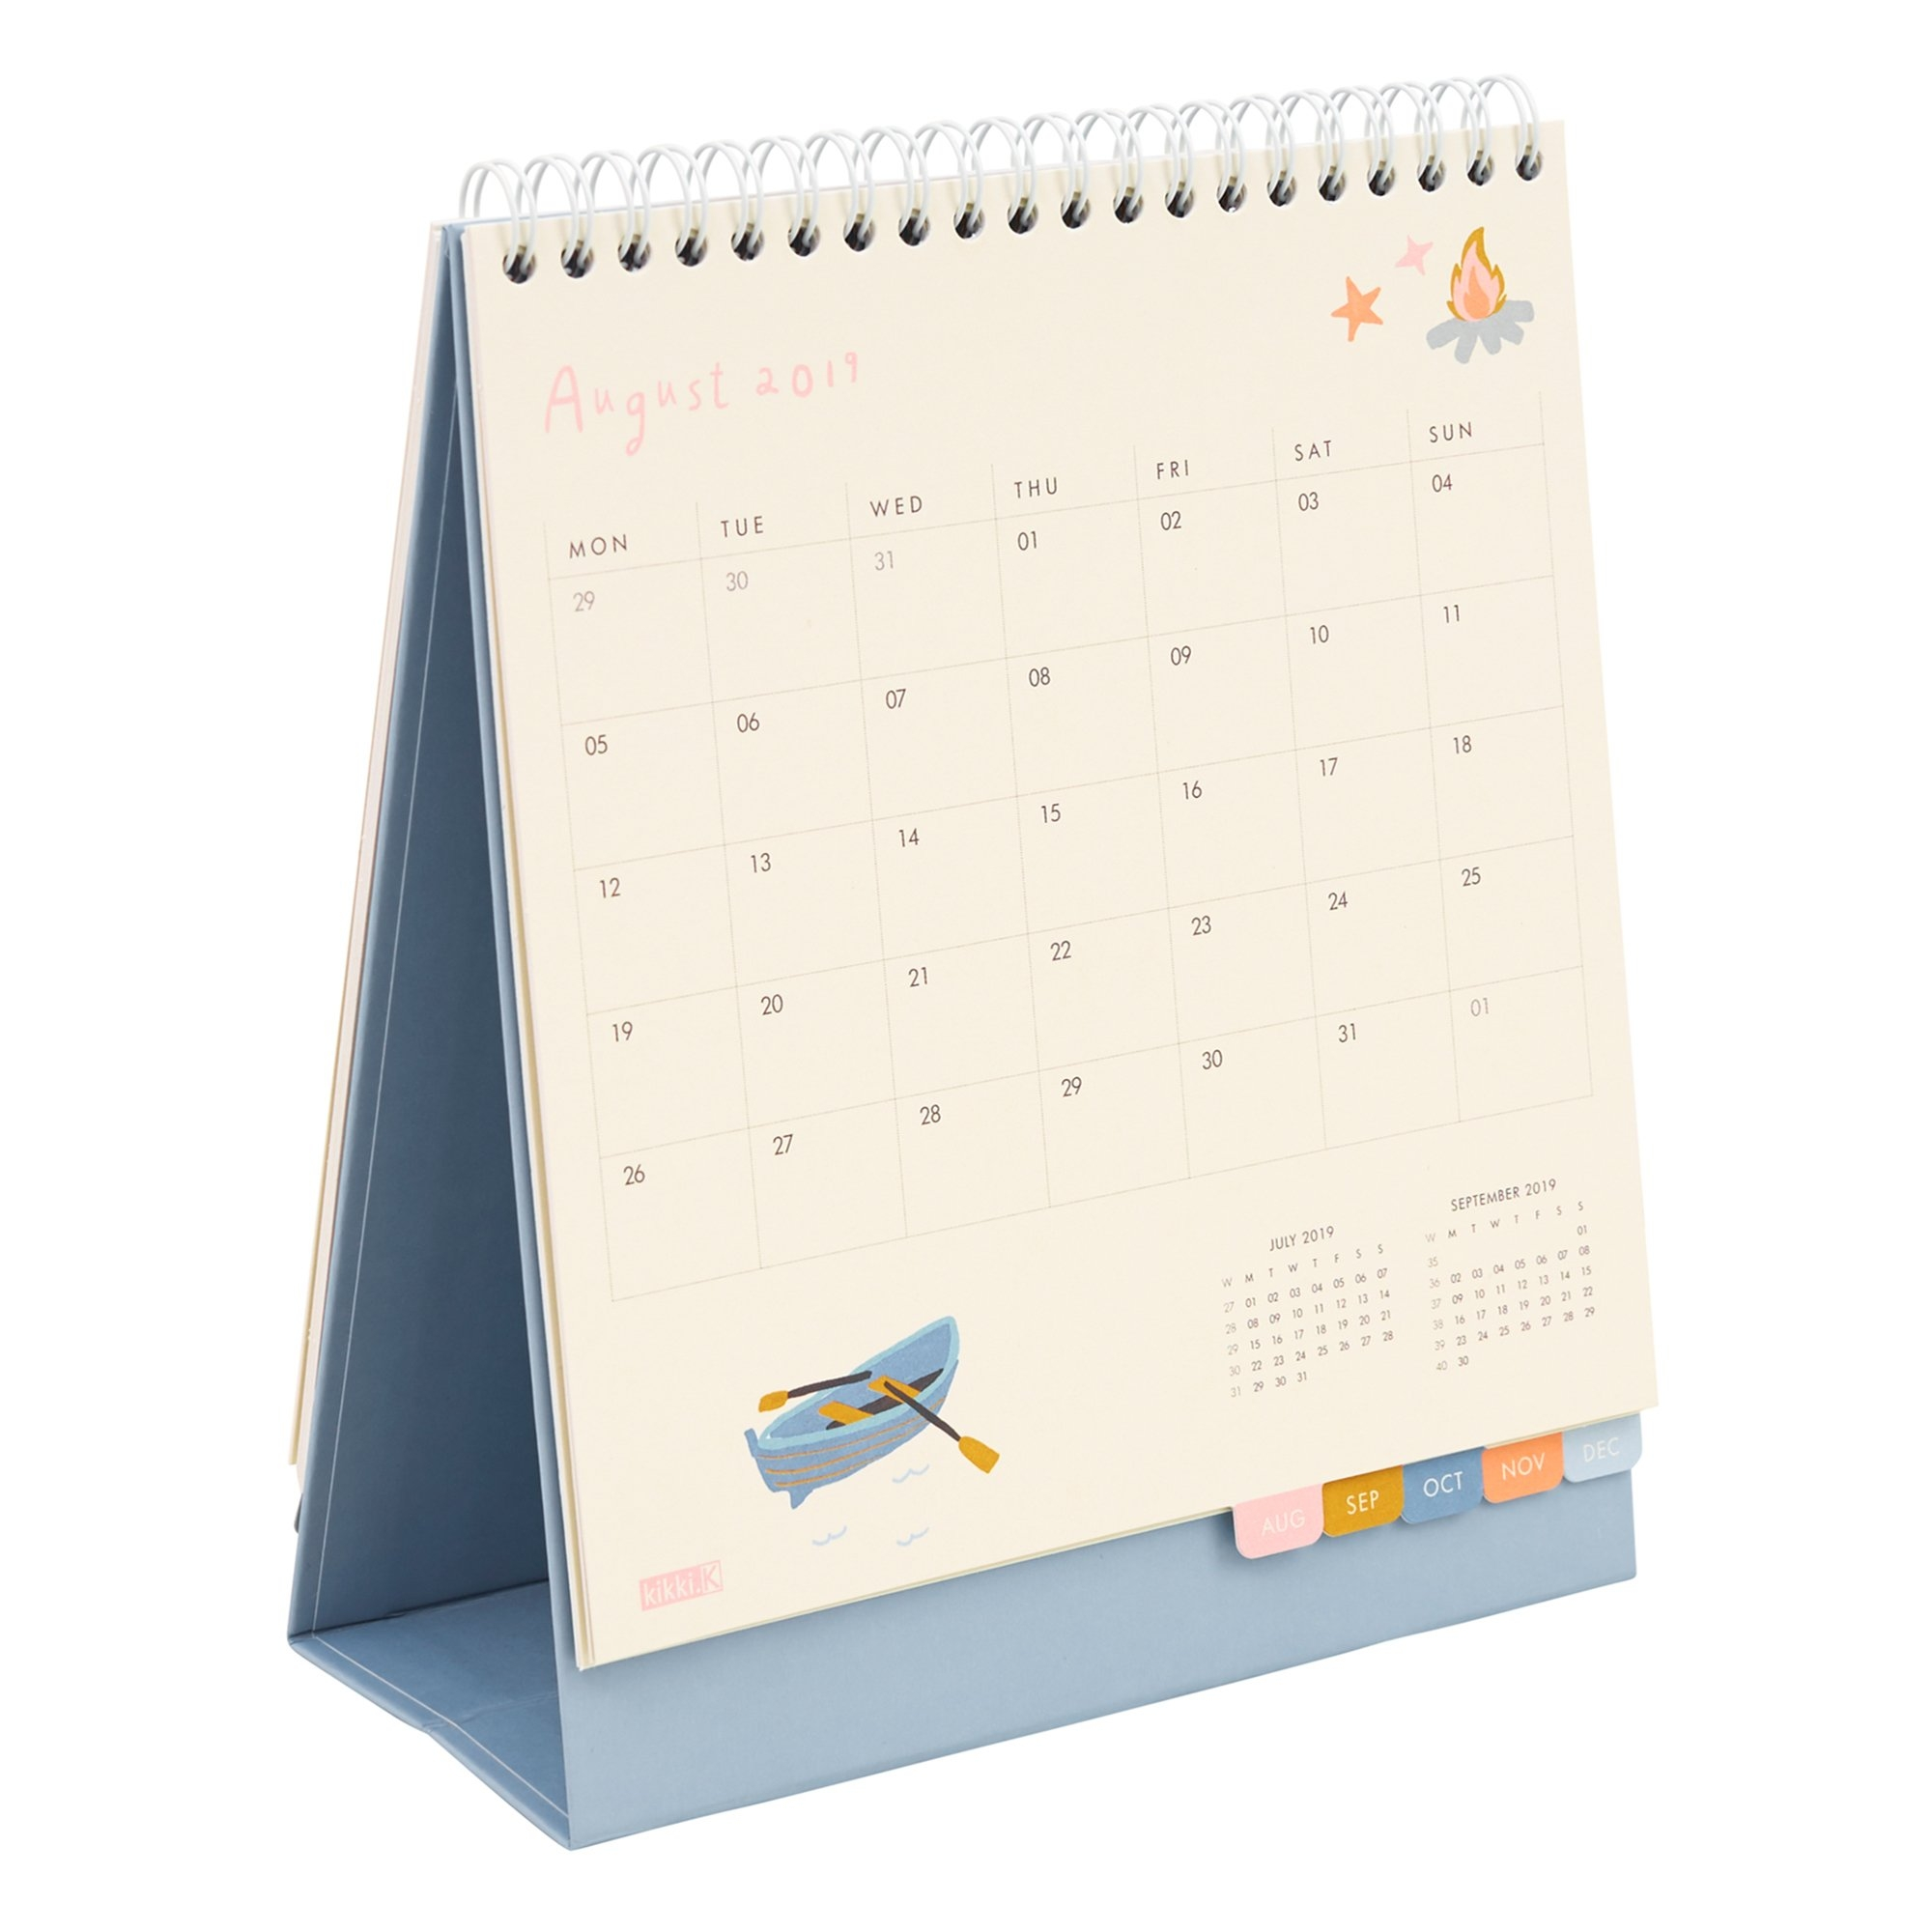 2019 Desk Calendar: Sweet   Calendars   Kikki.k Calendar 2019 Notebook